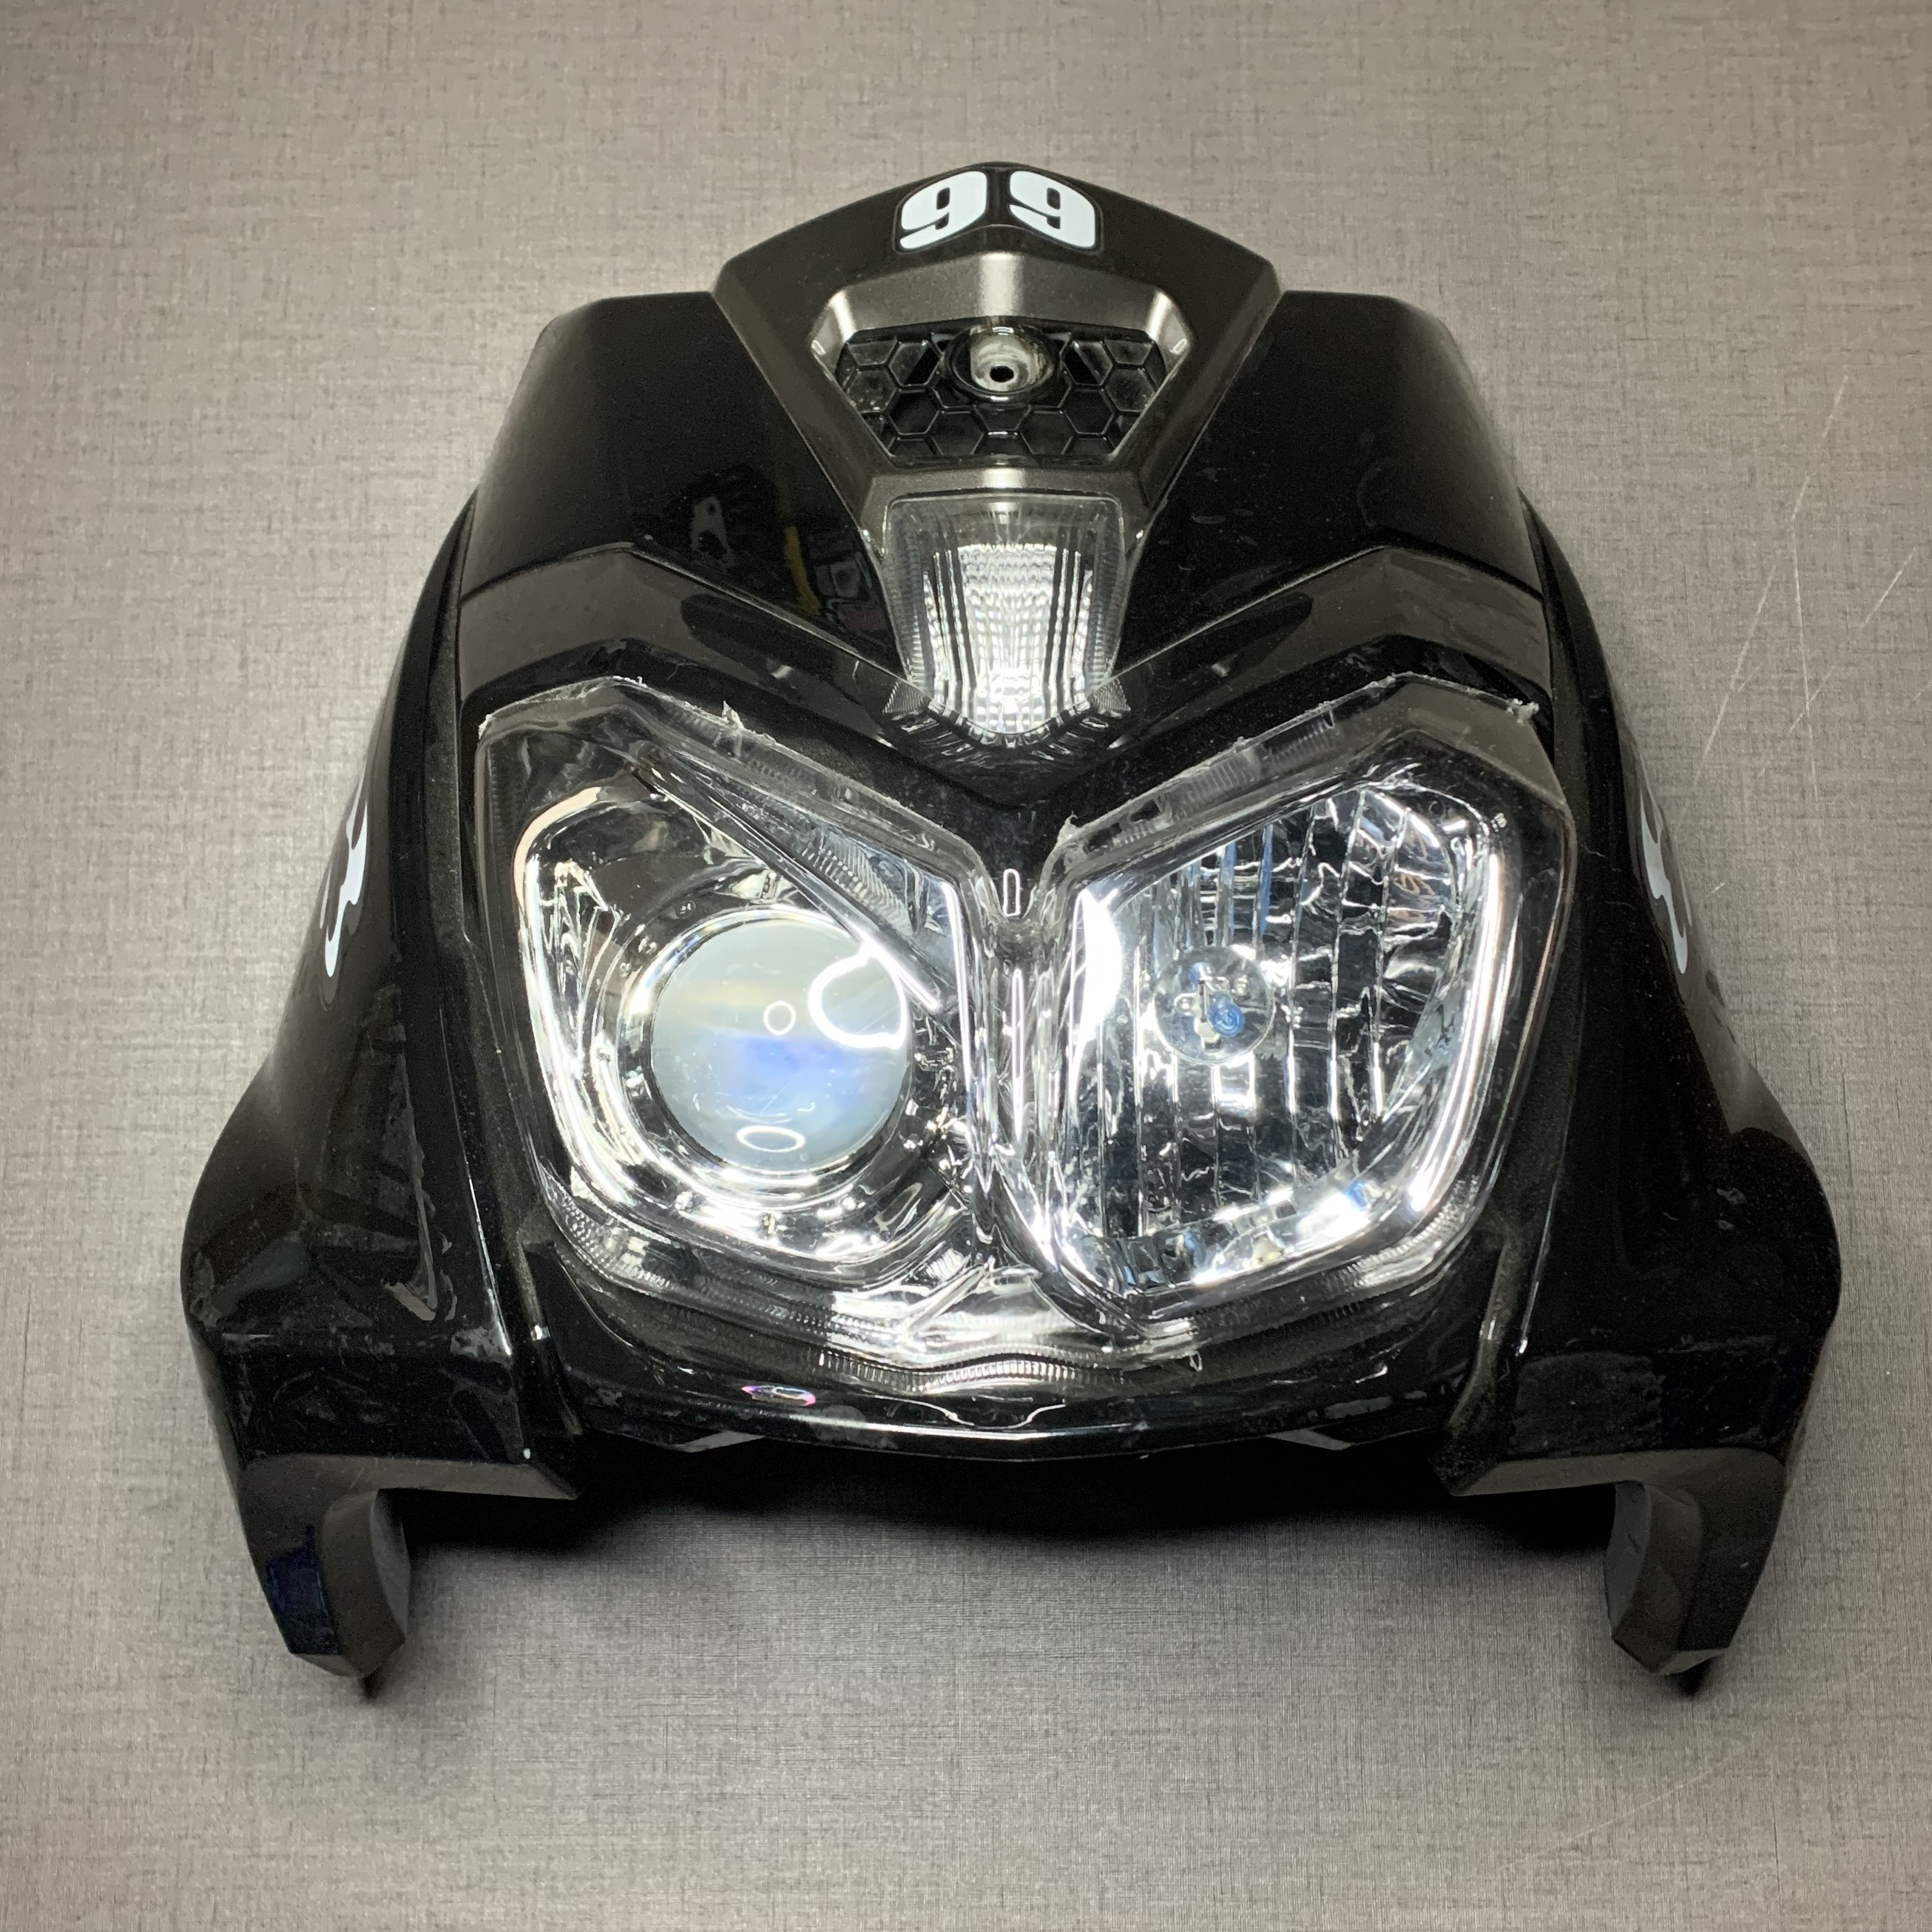 BWS125 Body Kit LED Front Light Inner Panel Fairing Kits Racing Tuning Parts Bws 125